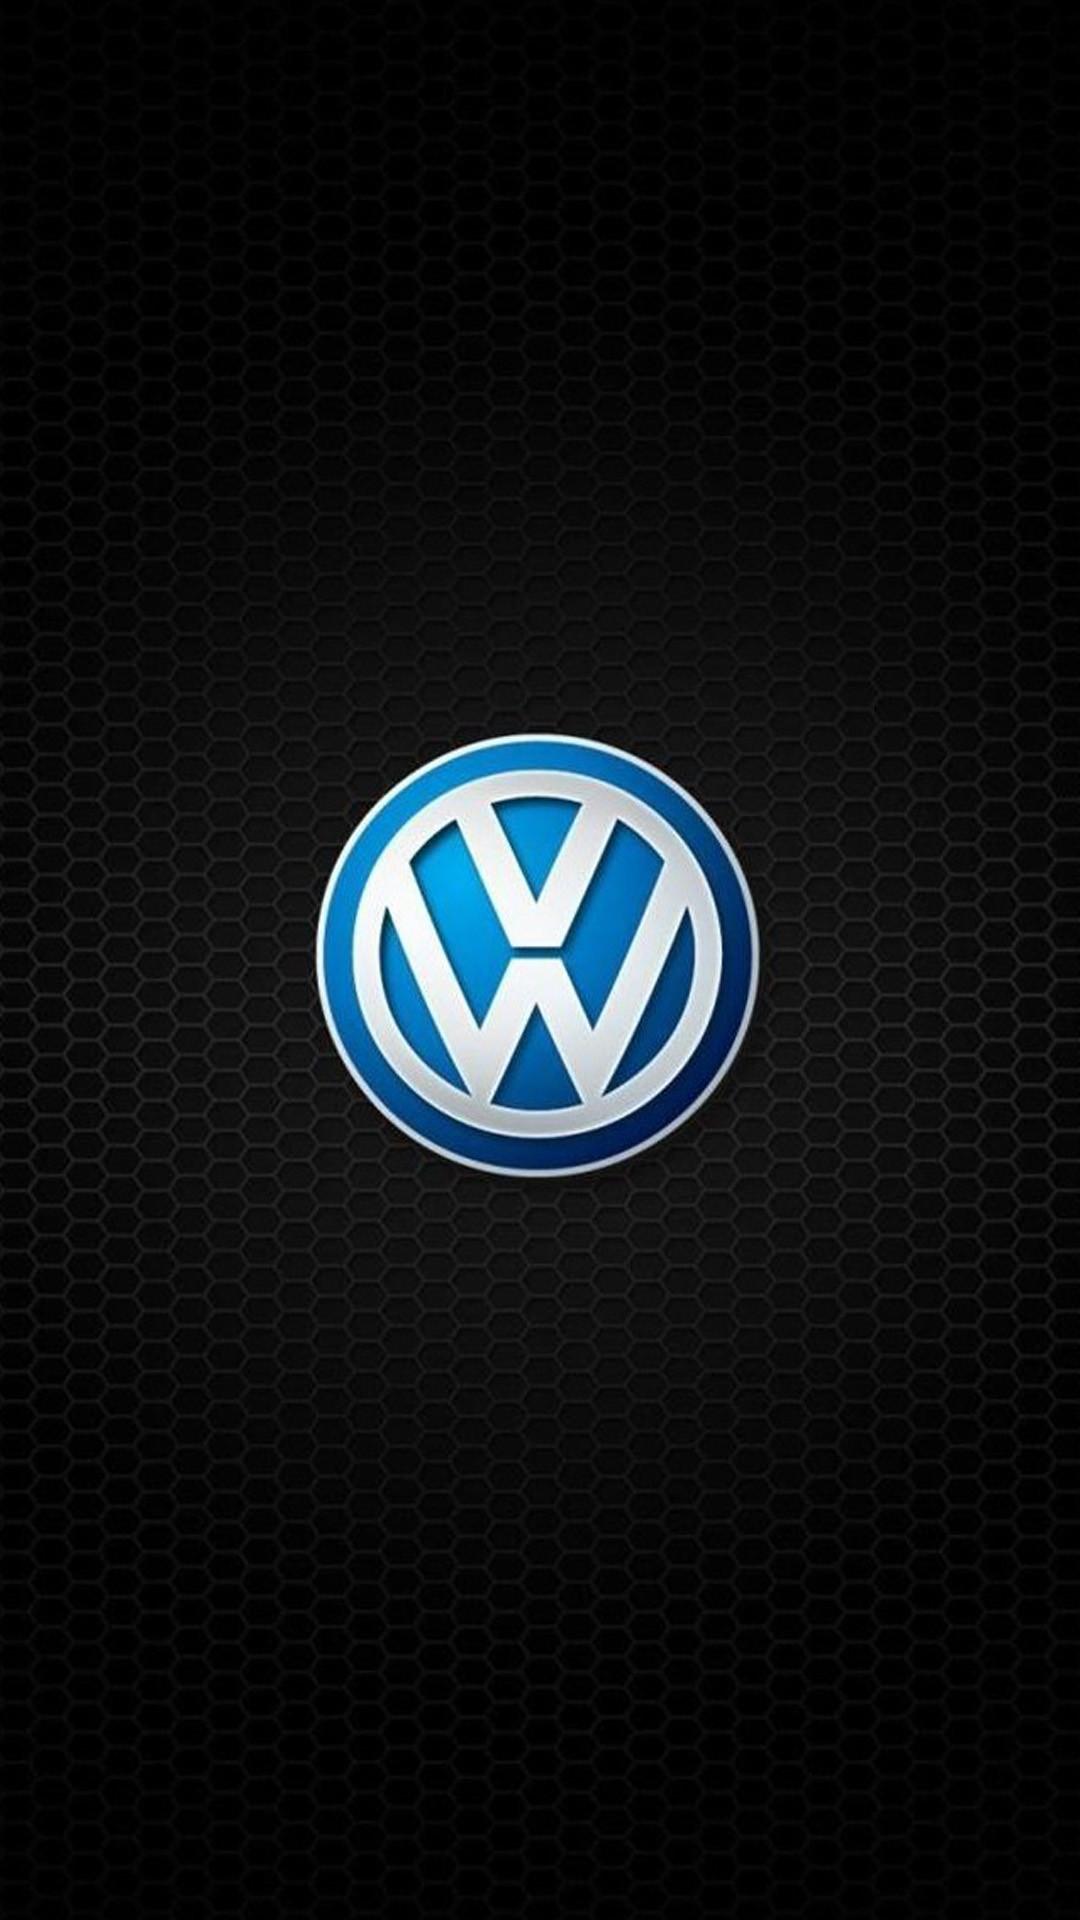 Jaguar Car Wallpaper Hd For Mobile Seat Ibe Scheinwerfer